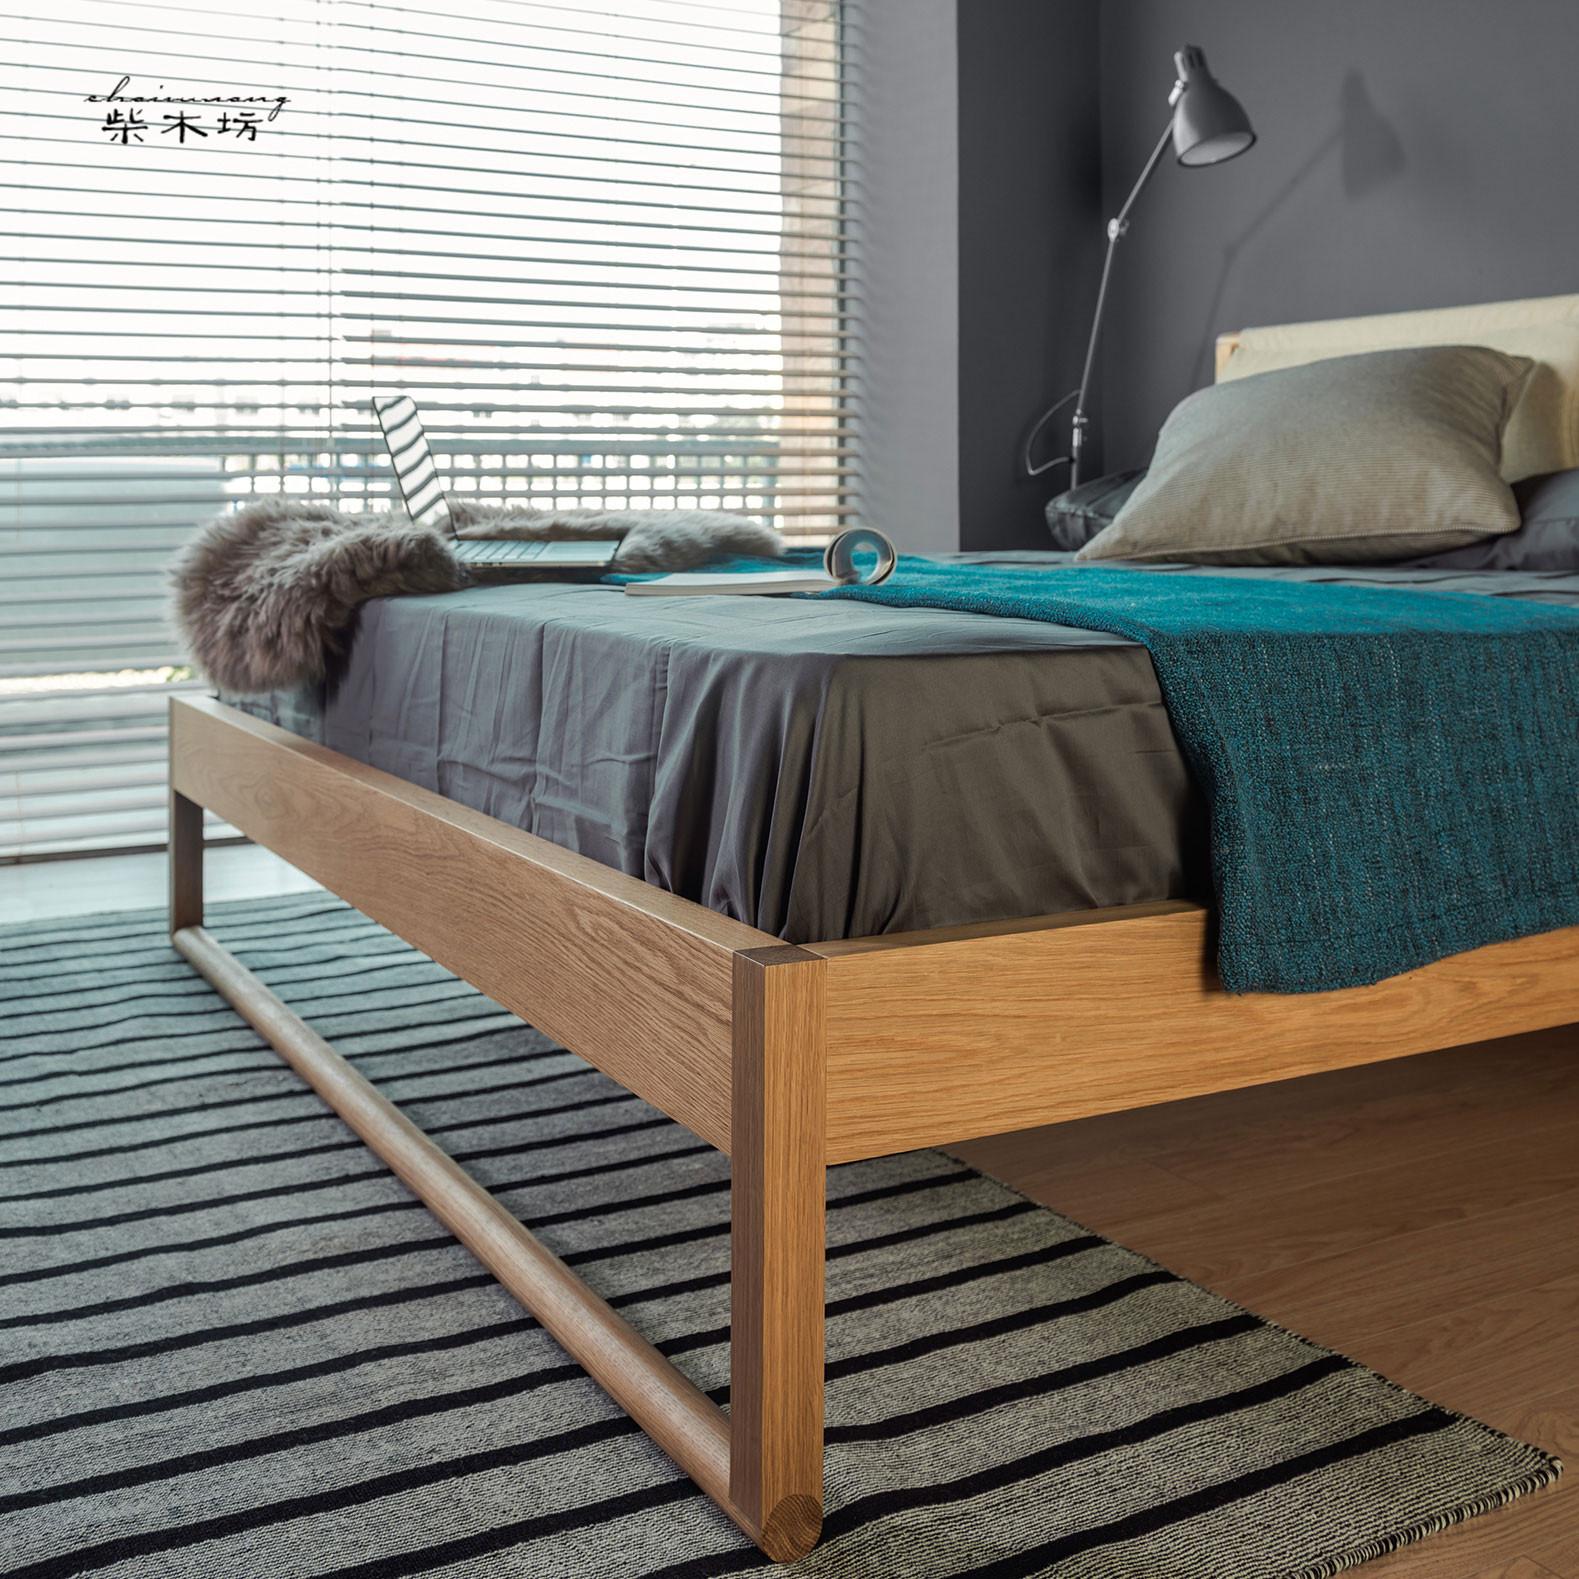 The Nordic modern minimalist Japanese wedding large-sized apartment cloth backrest soft oak walnut bed